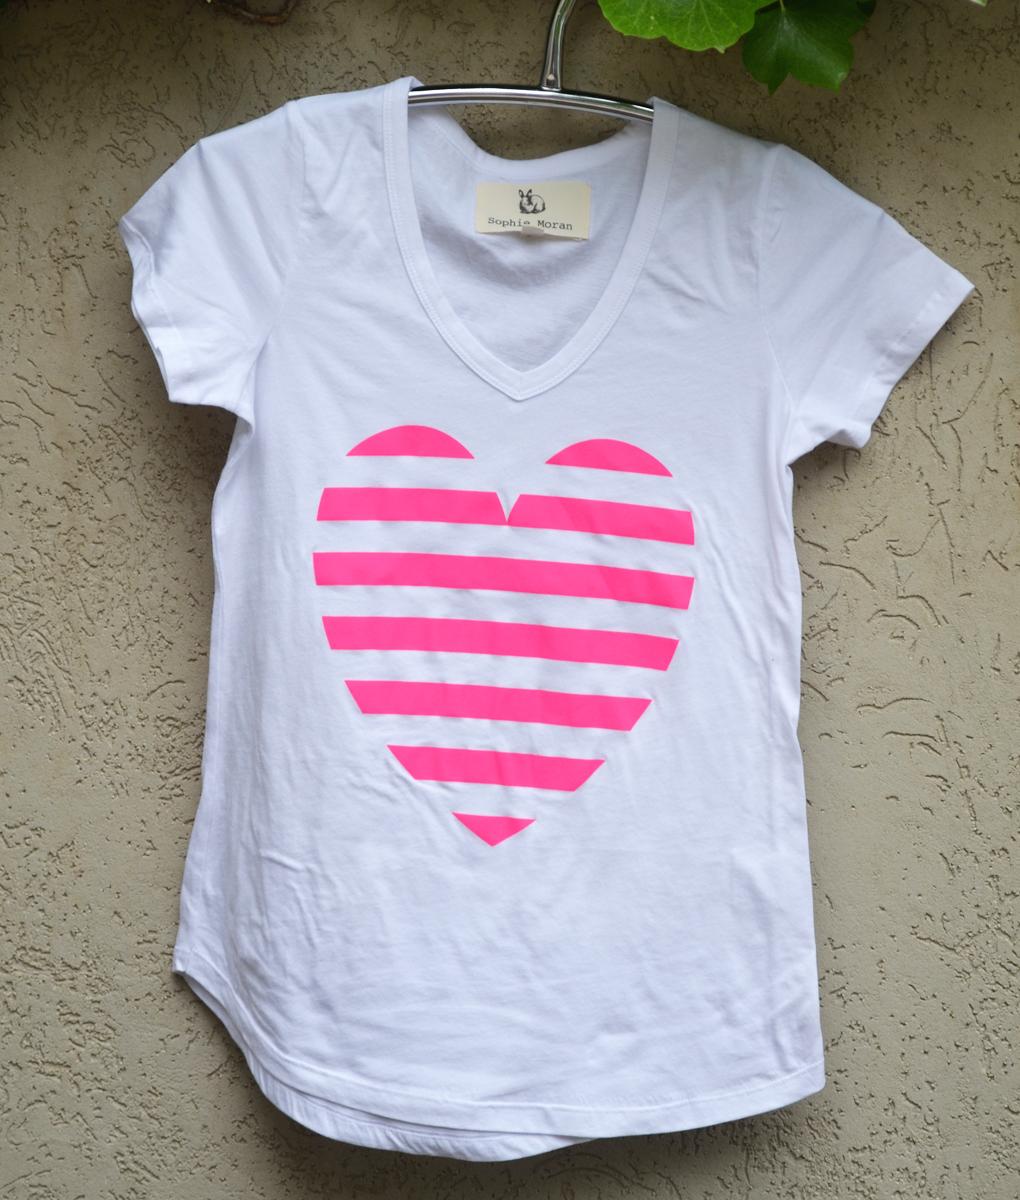 T'shirt white bright pink heart